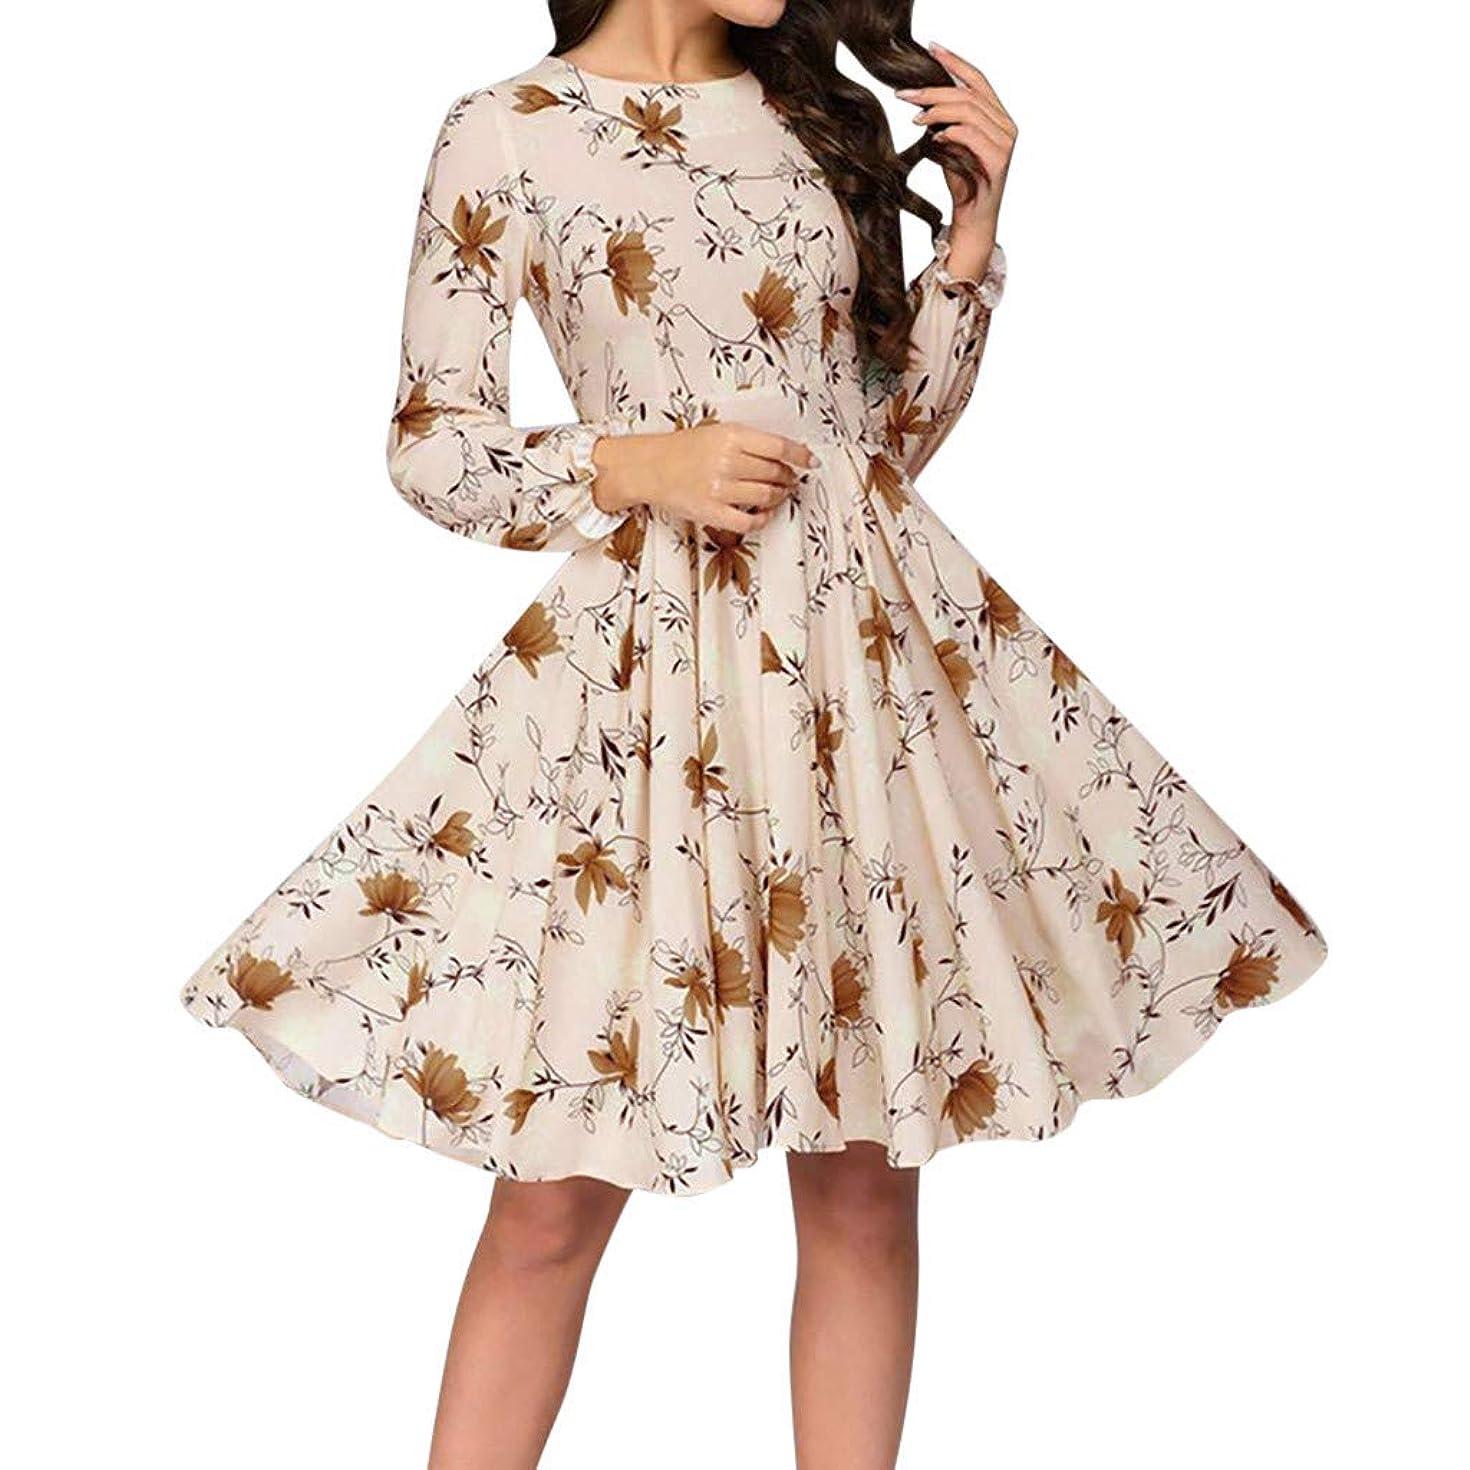 Summer Plain Dress, Tronet Women Printing A-line Elegant Ruffles Long Sleeve Knee-Length Vintage Dress